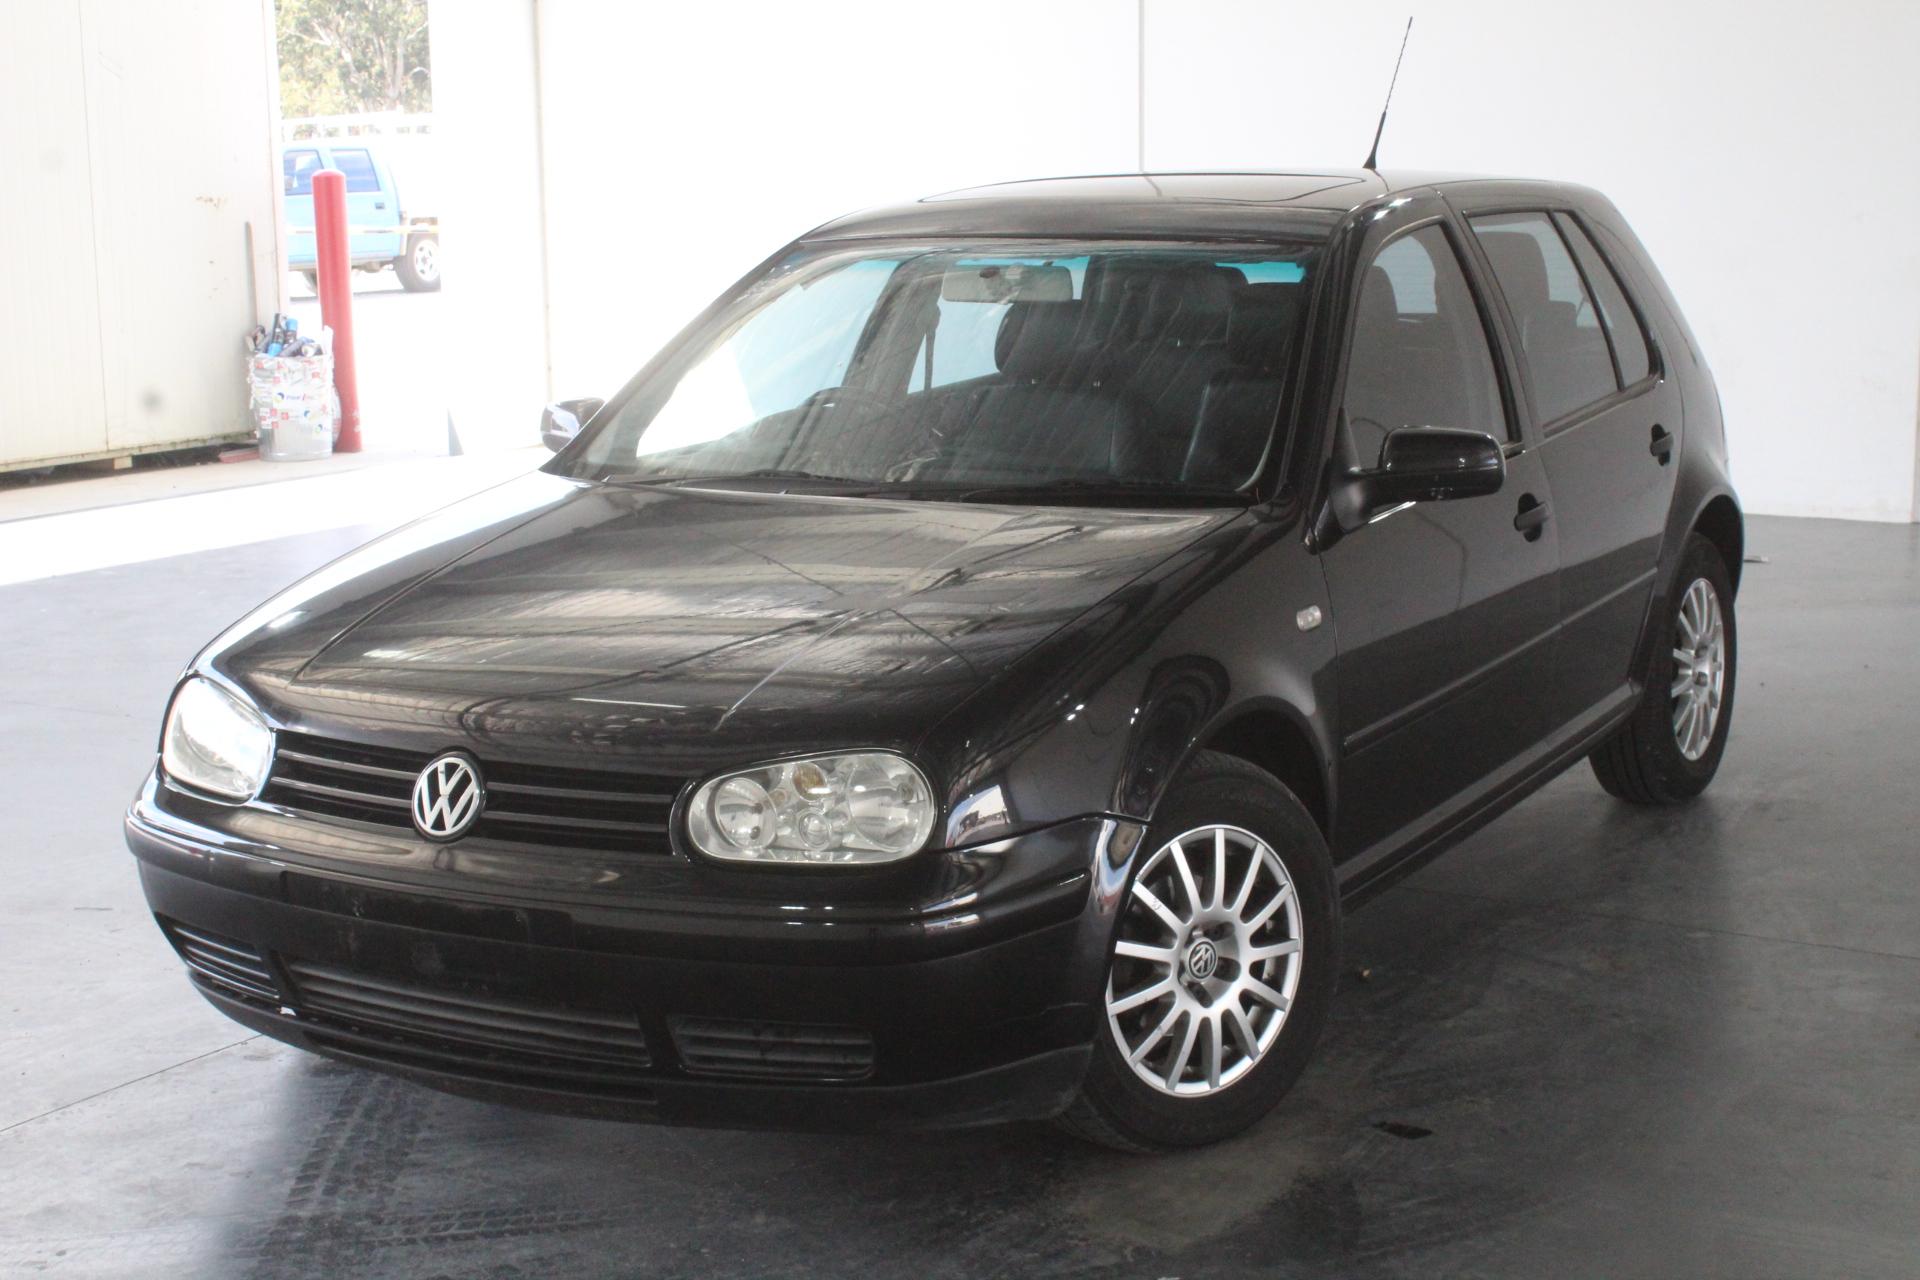 2002 Volkswagen Golf 1.6 SE A4 Automatic Hatchback